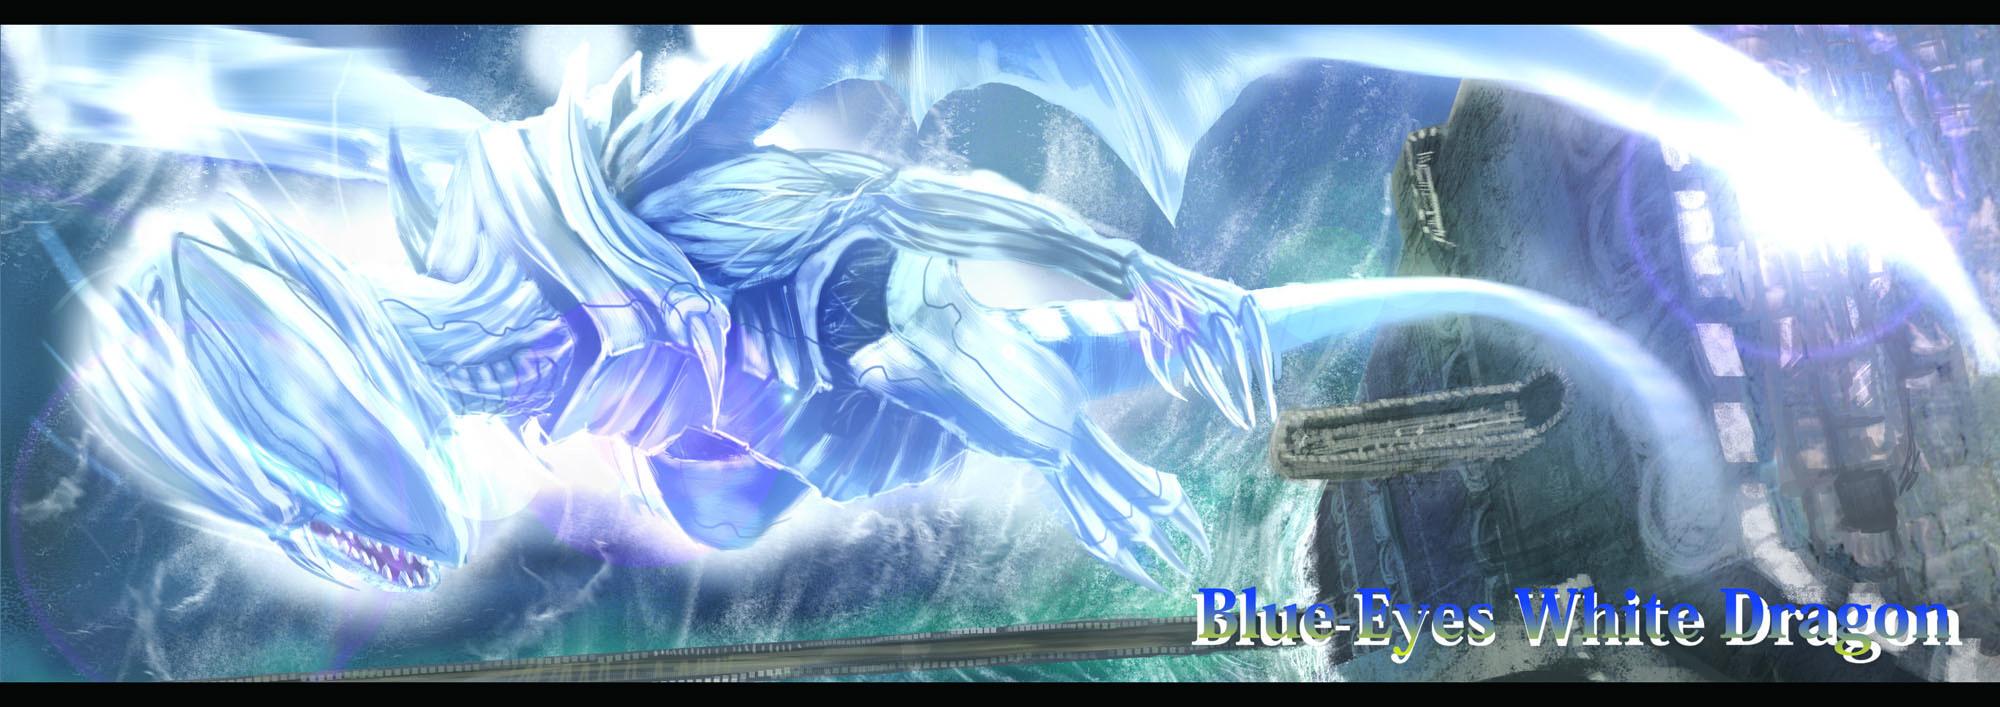 blue eyes white dragon yu gi oh duel monsters image 670369